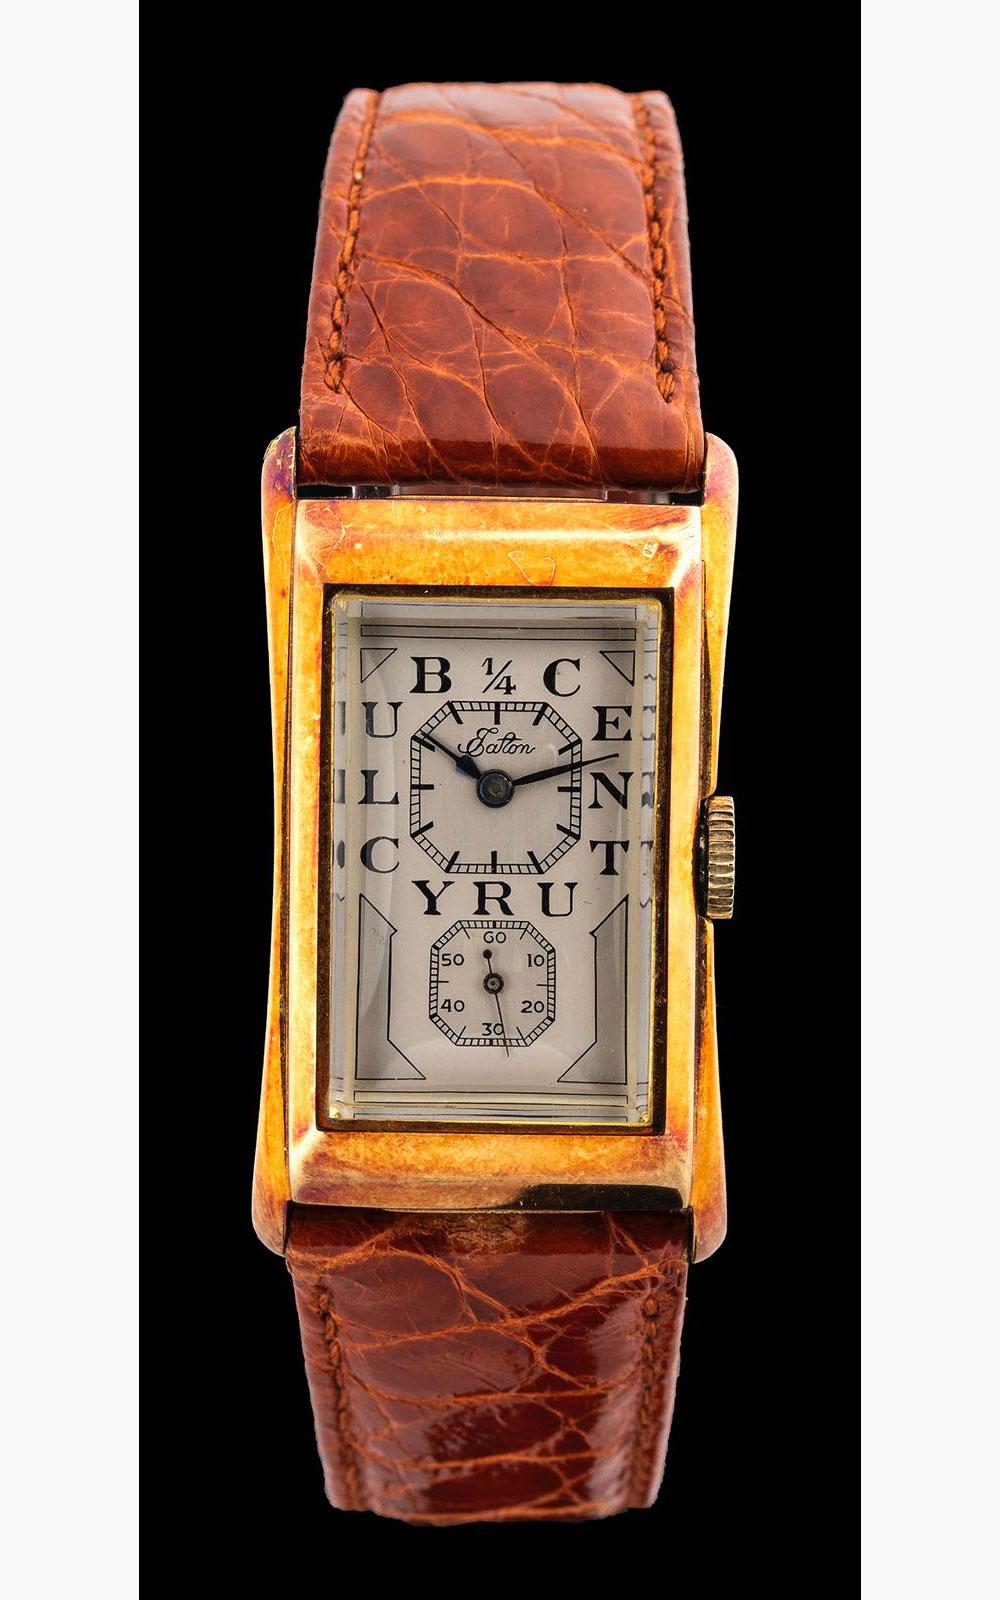 Rolex Prince ¼ Century club gold, 1947